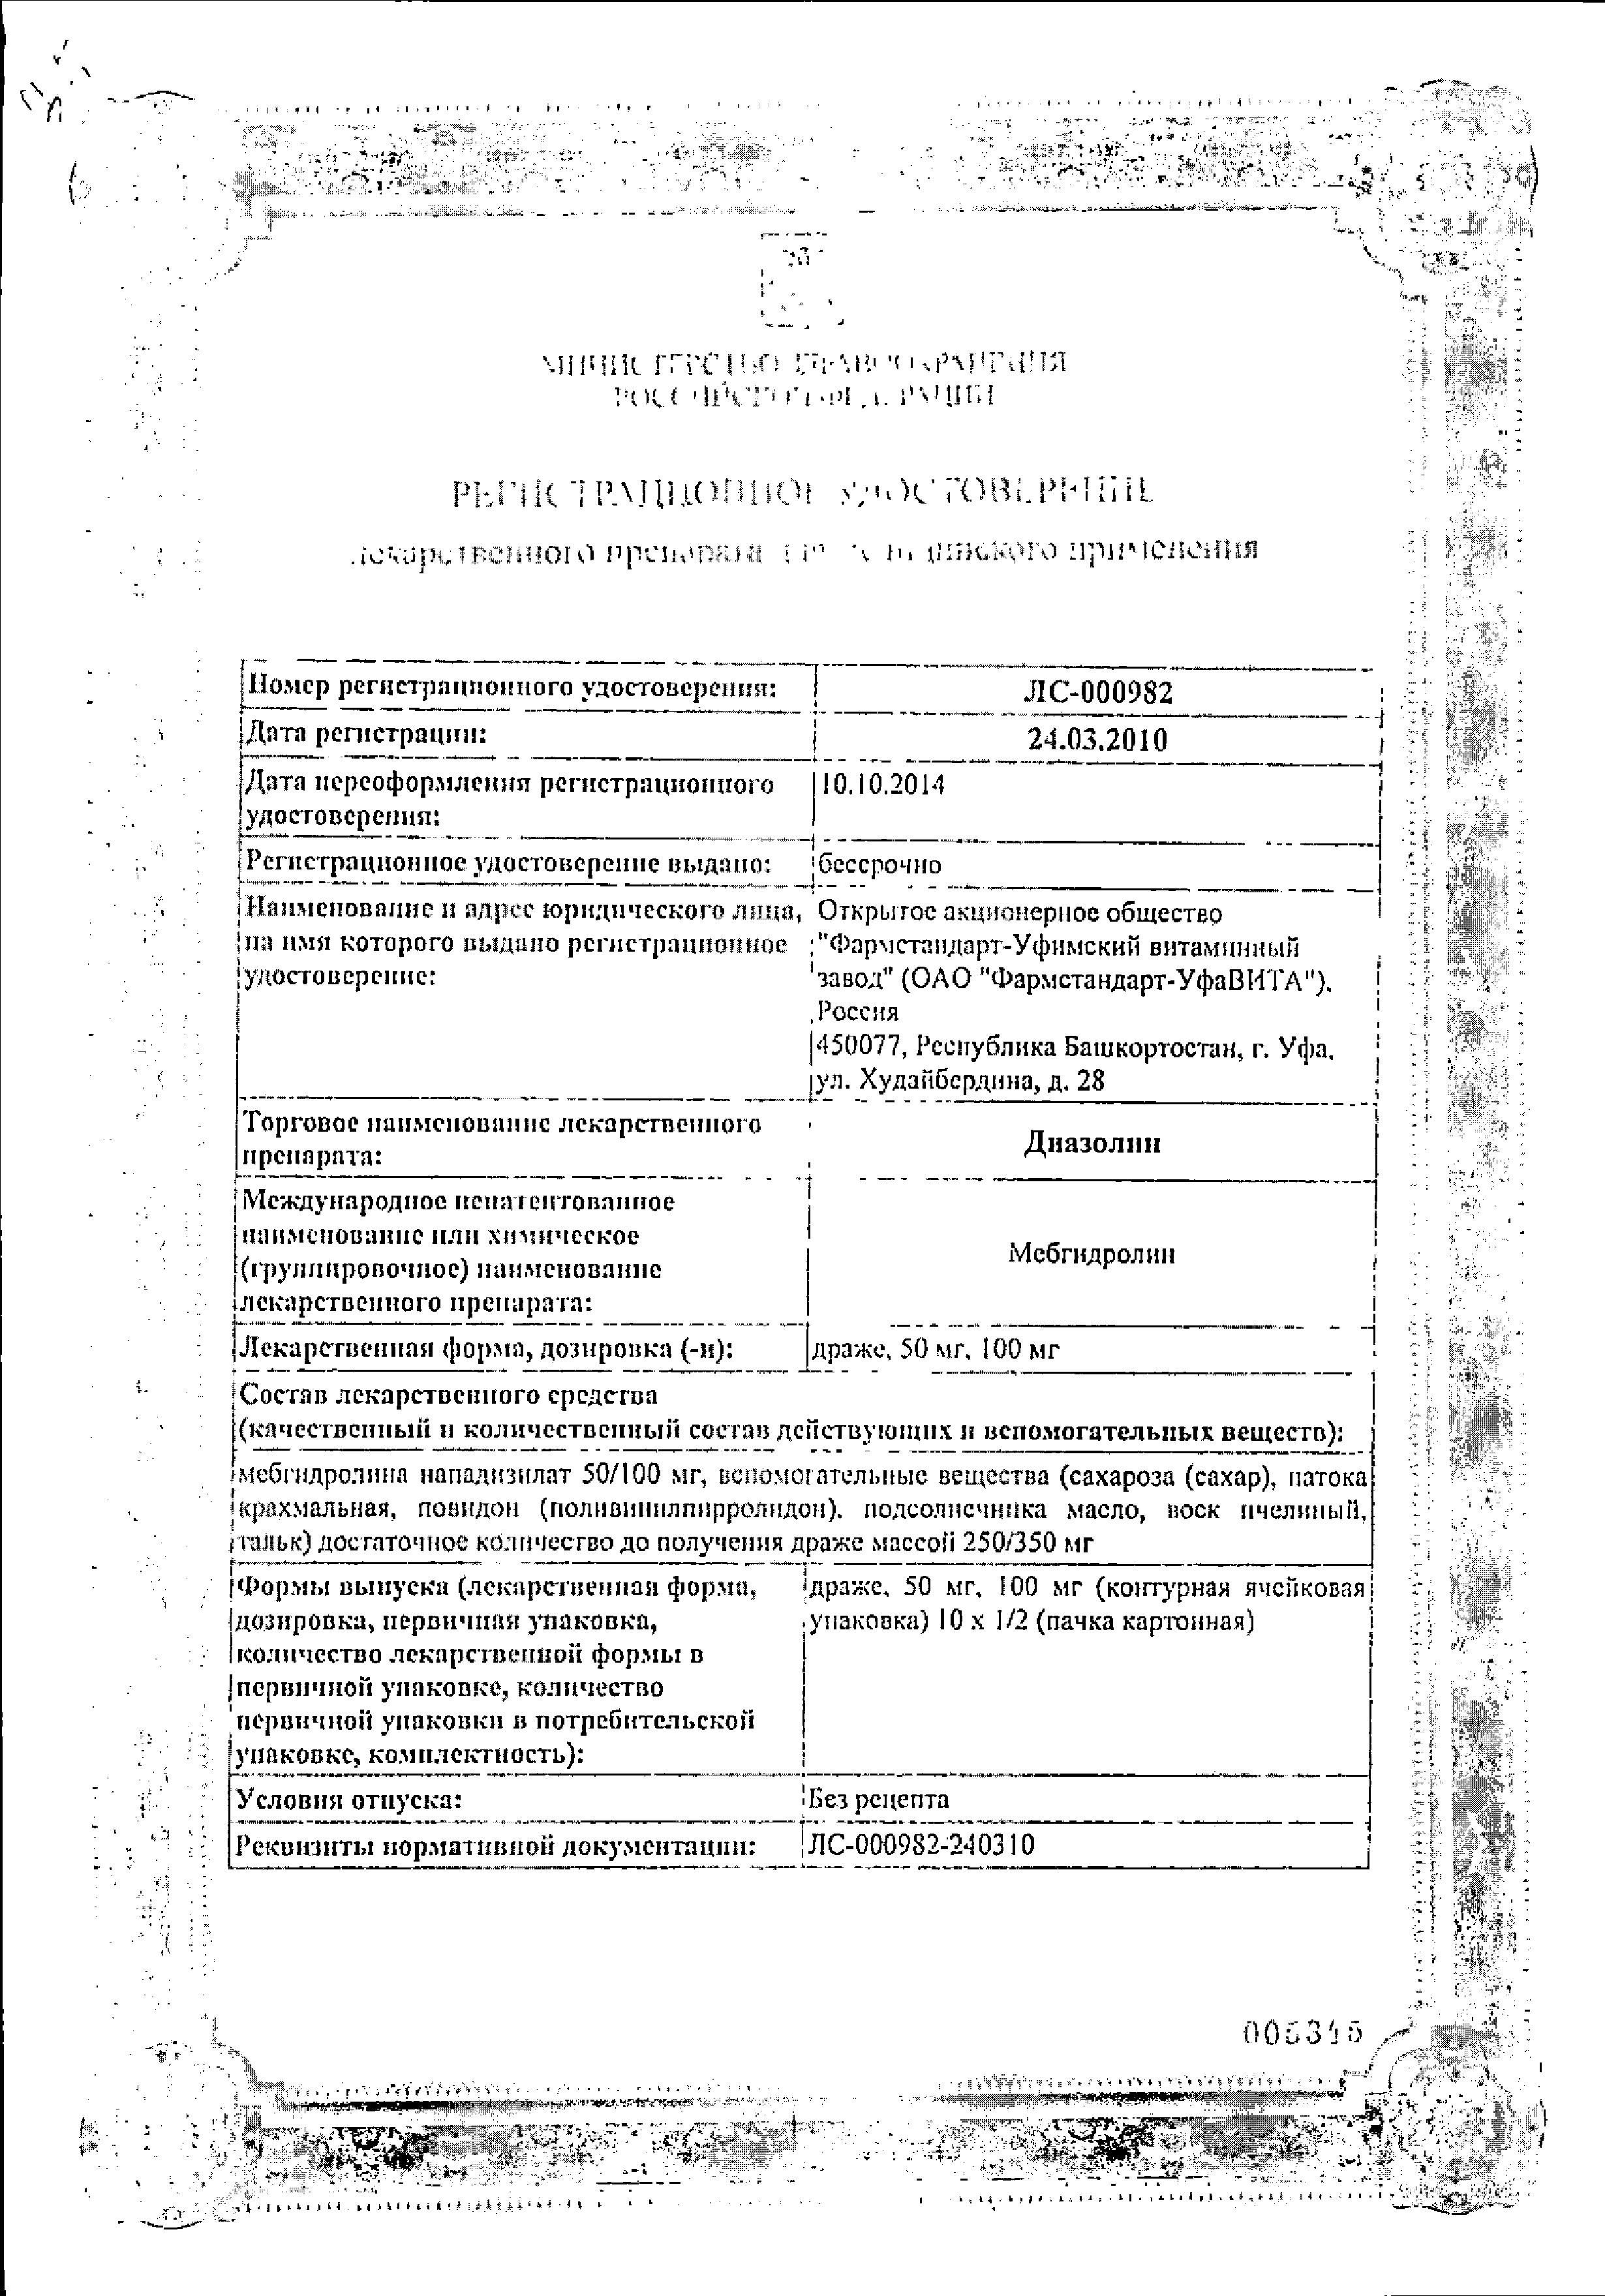 Диазолин сертификат